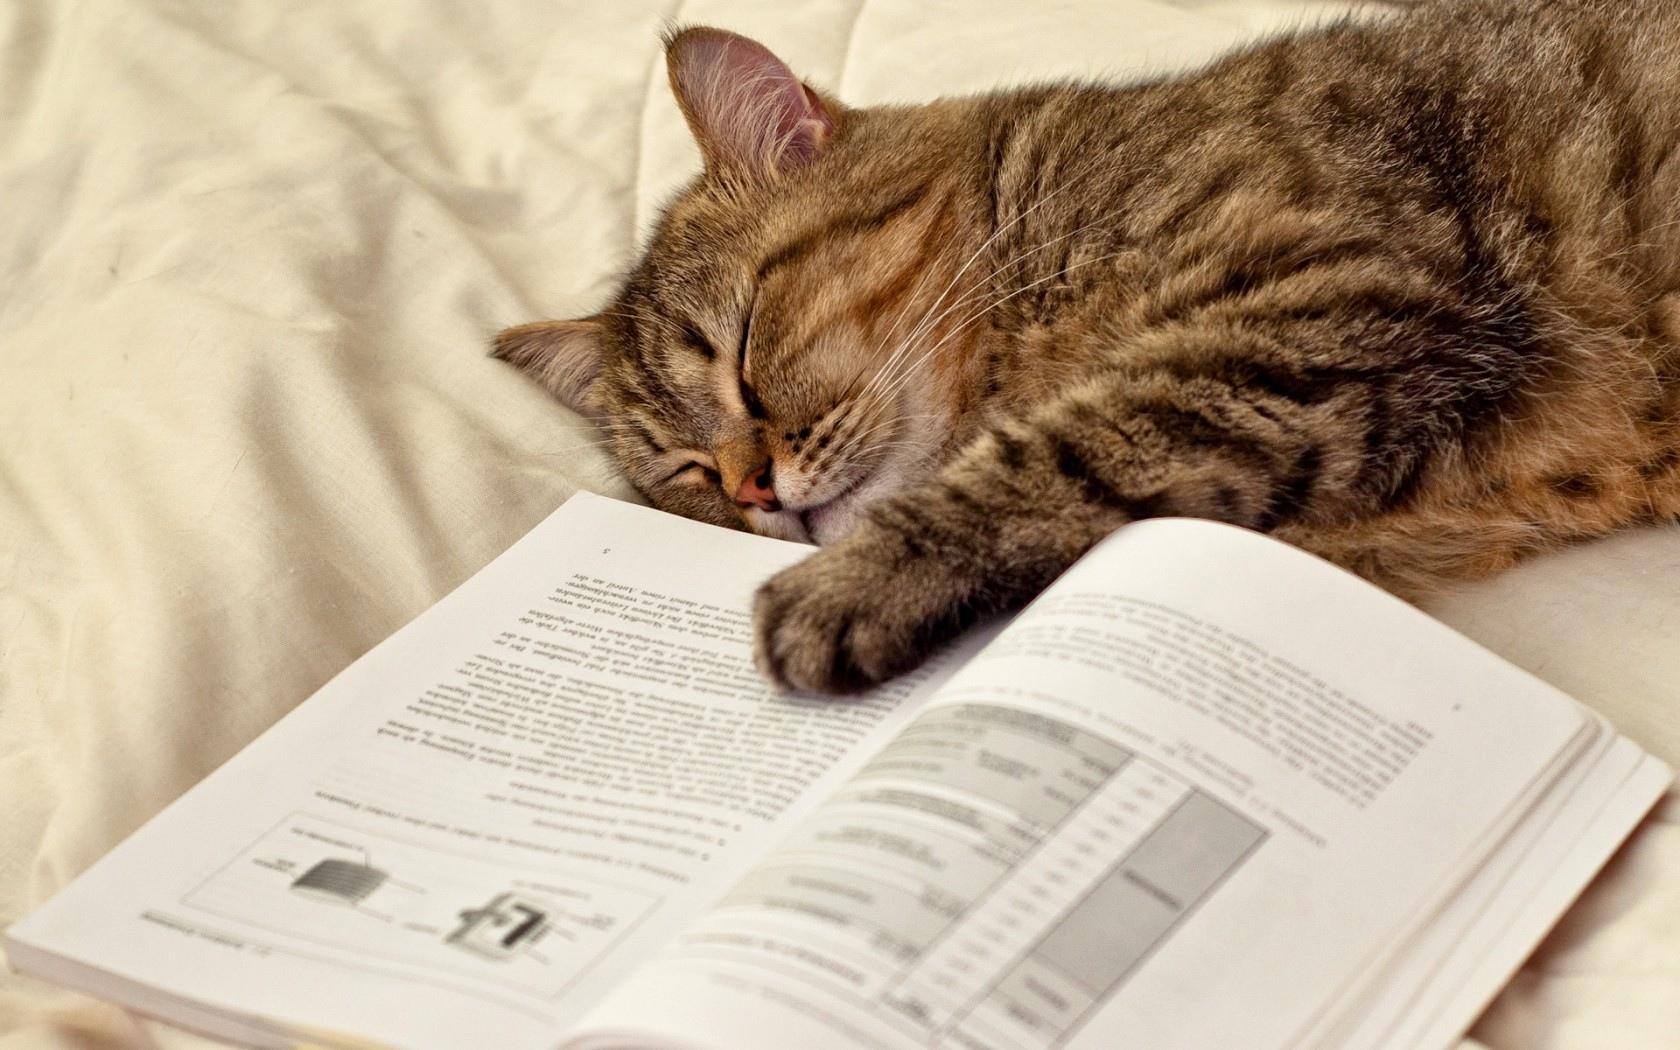 50561-cat-sleeping-lying-paw-humor-books